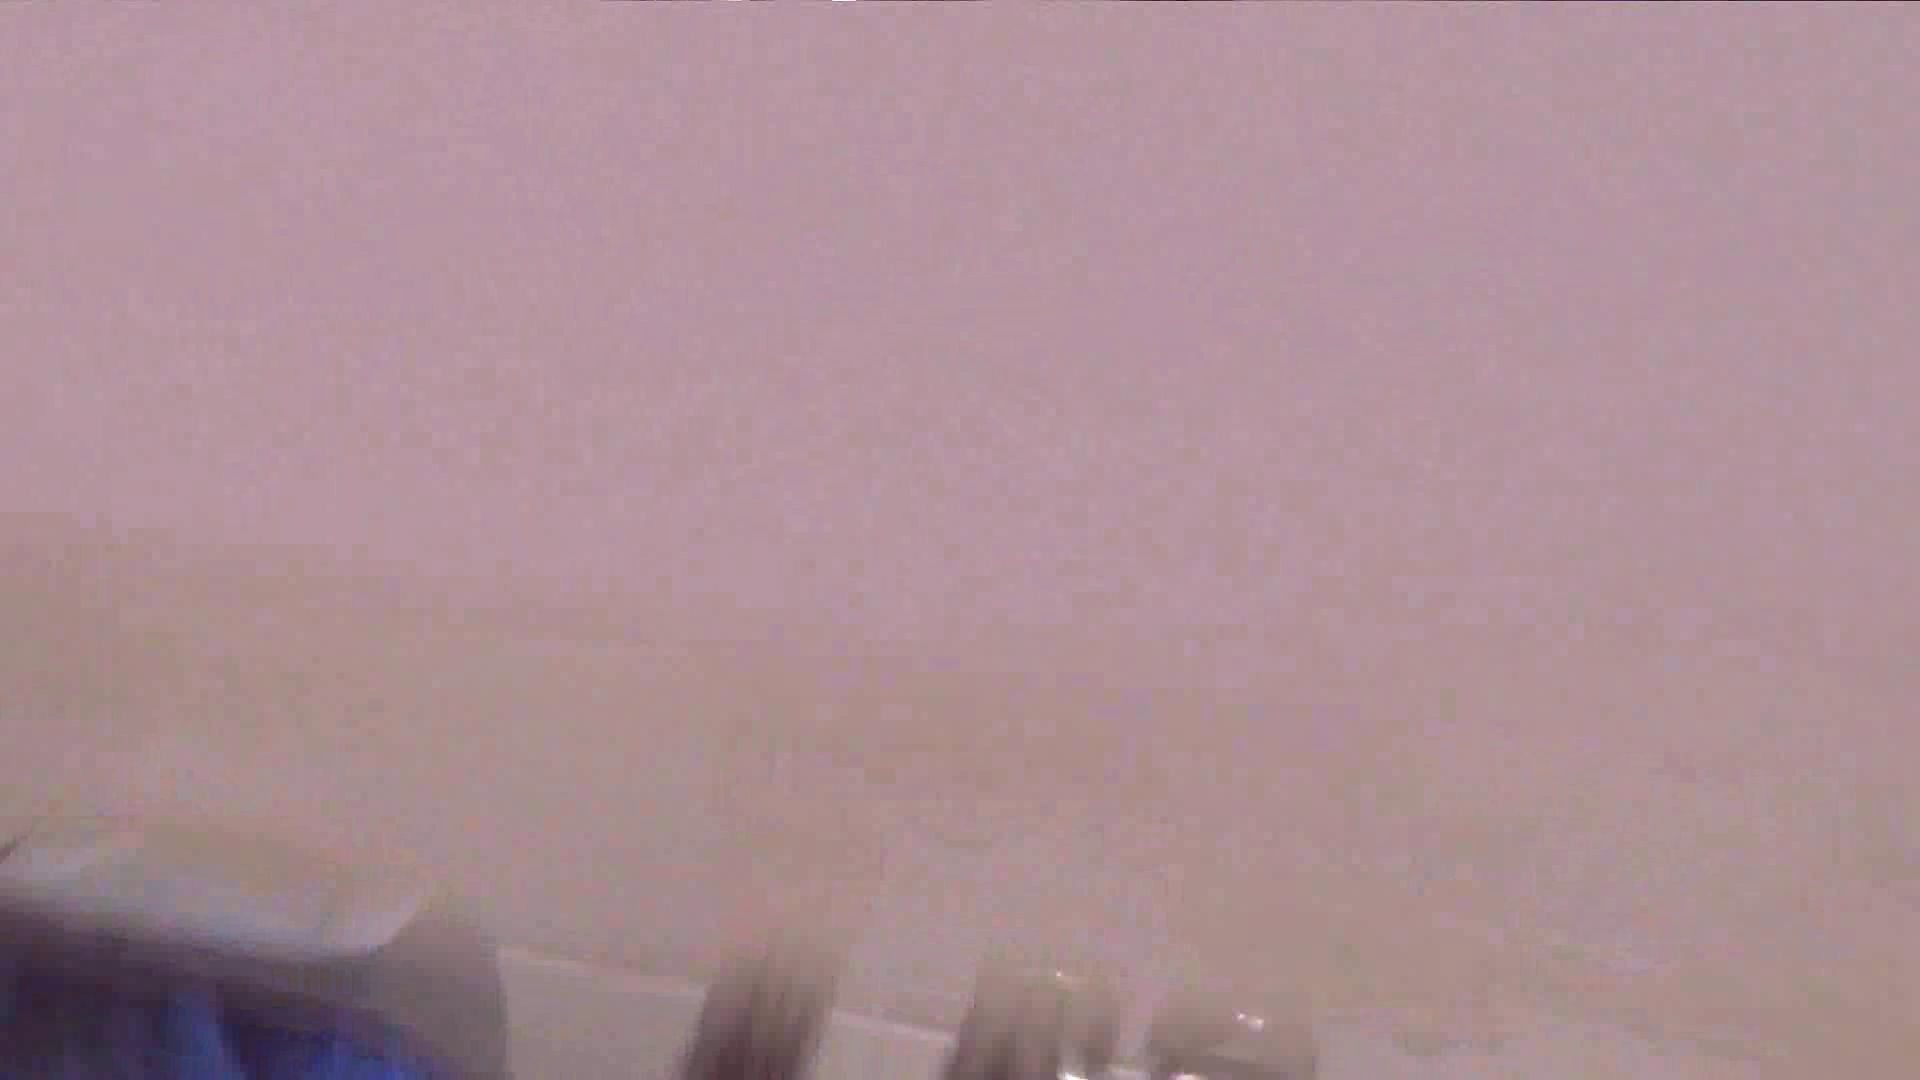 vol.17 命がけ潜伏洗面所! 張り裂けんばかりの大物 プライベート ワレメ無修正動画無料 88pic 47